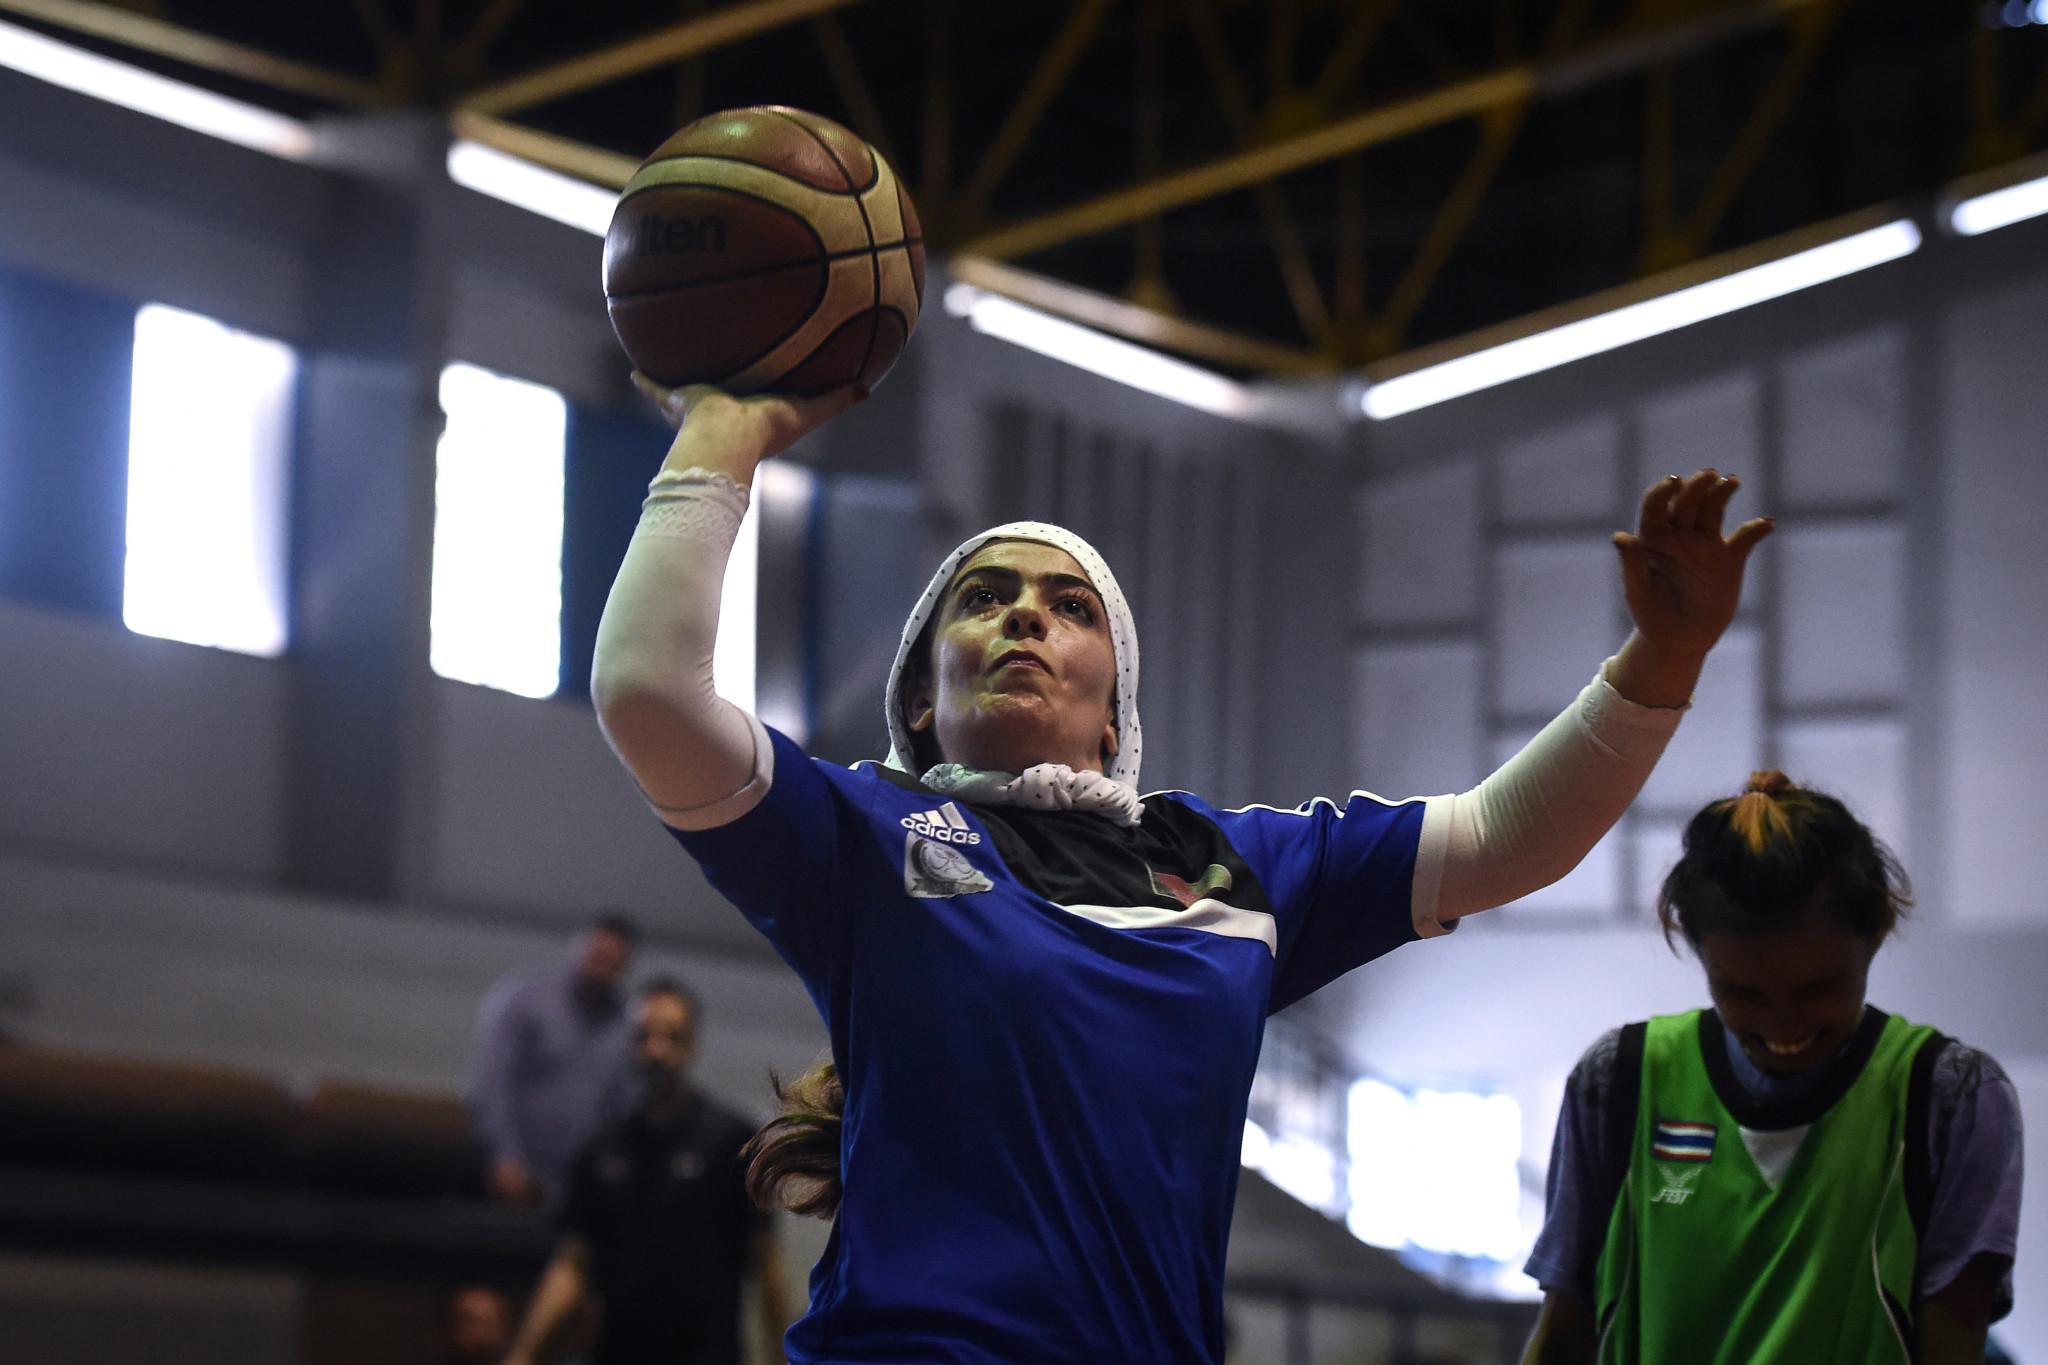 Afghanistan wheelchair basketball captain makes club debut in Spain